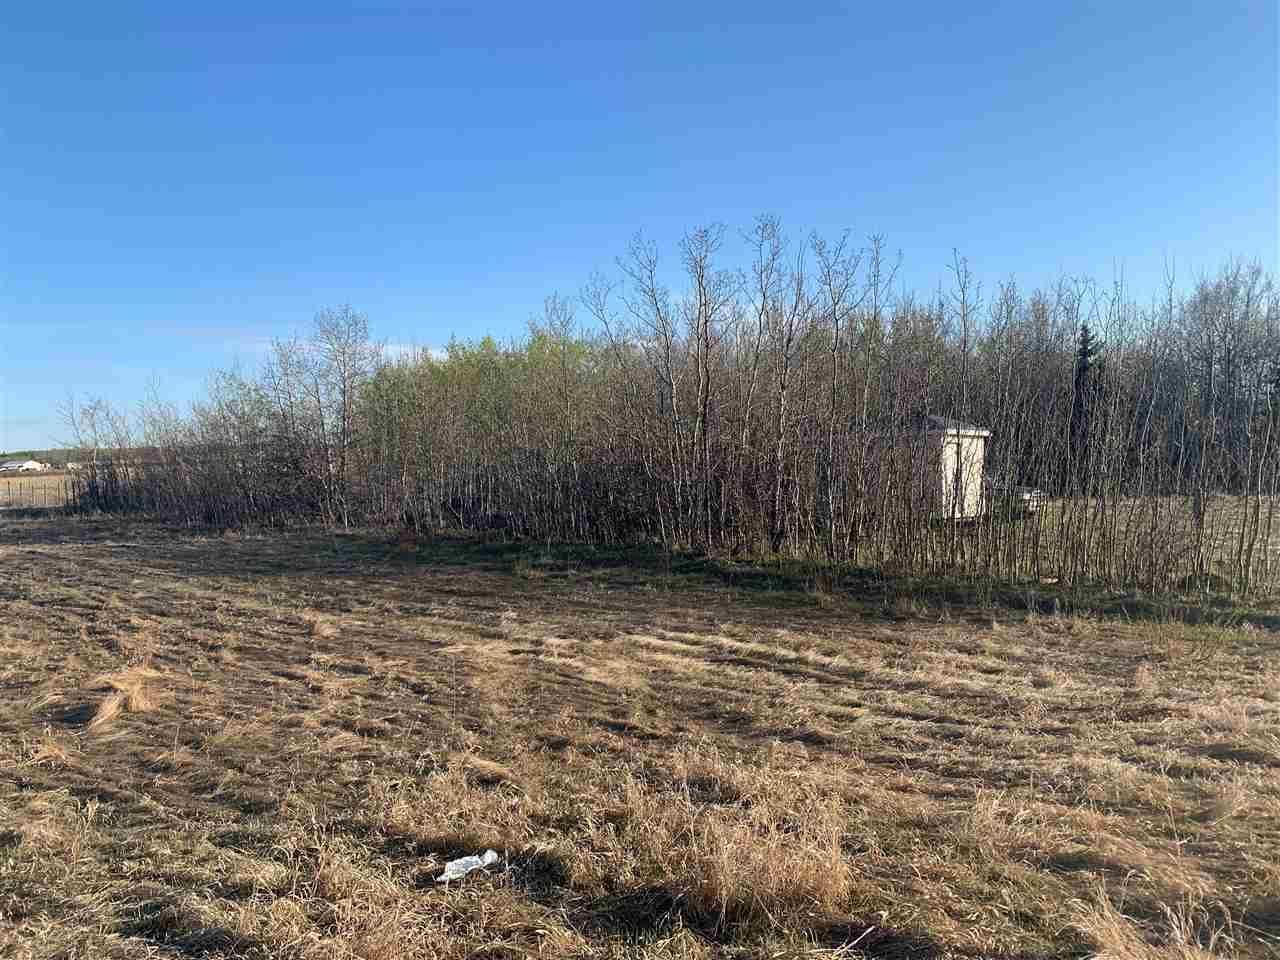 Main Photo: WM4R22TWP49 SEC33 QTR SW: Rural Leduc County Rural Land/Vacant Lot for sale : MLS®# E4243813